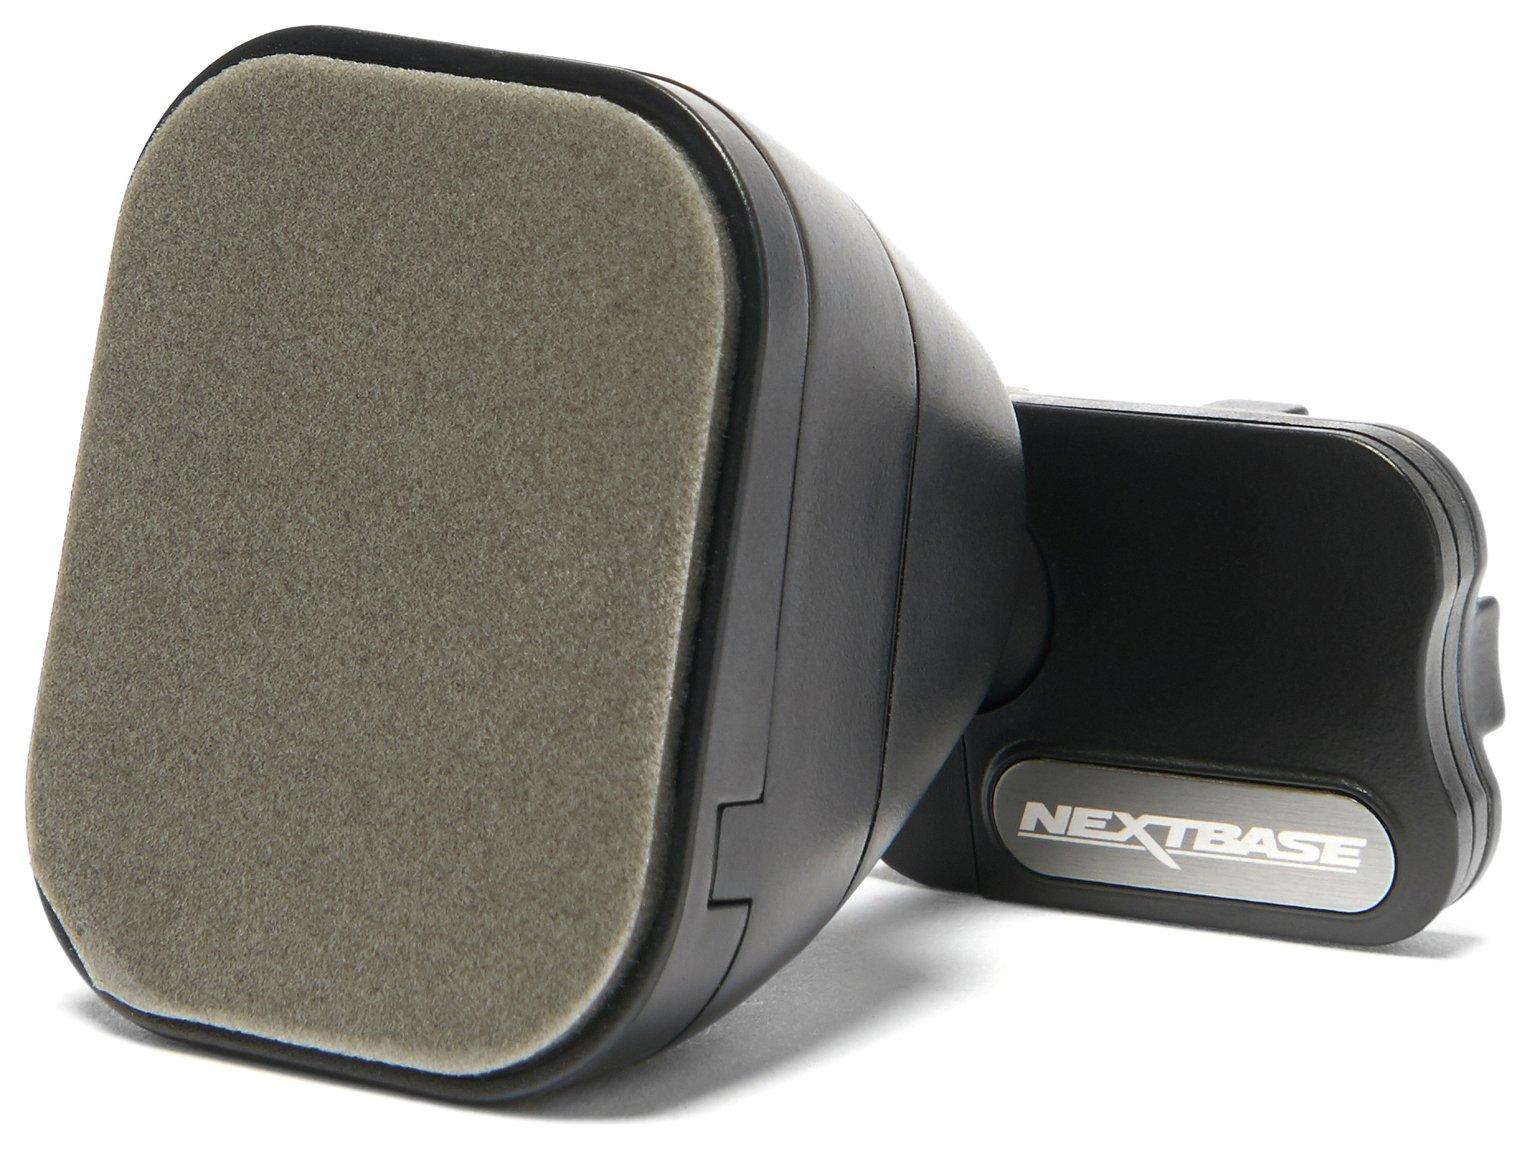 Nextbase Dash Cam Magnetic Powered GPS Mount